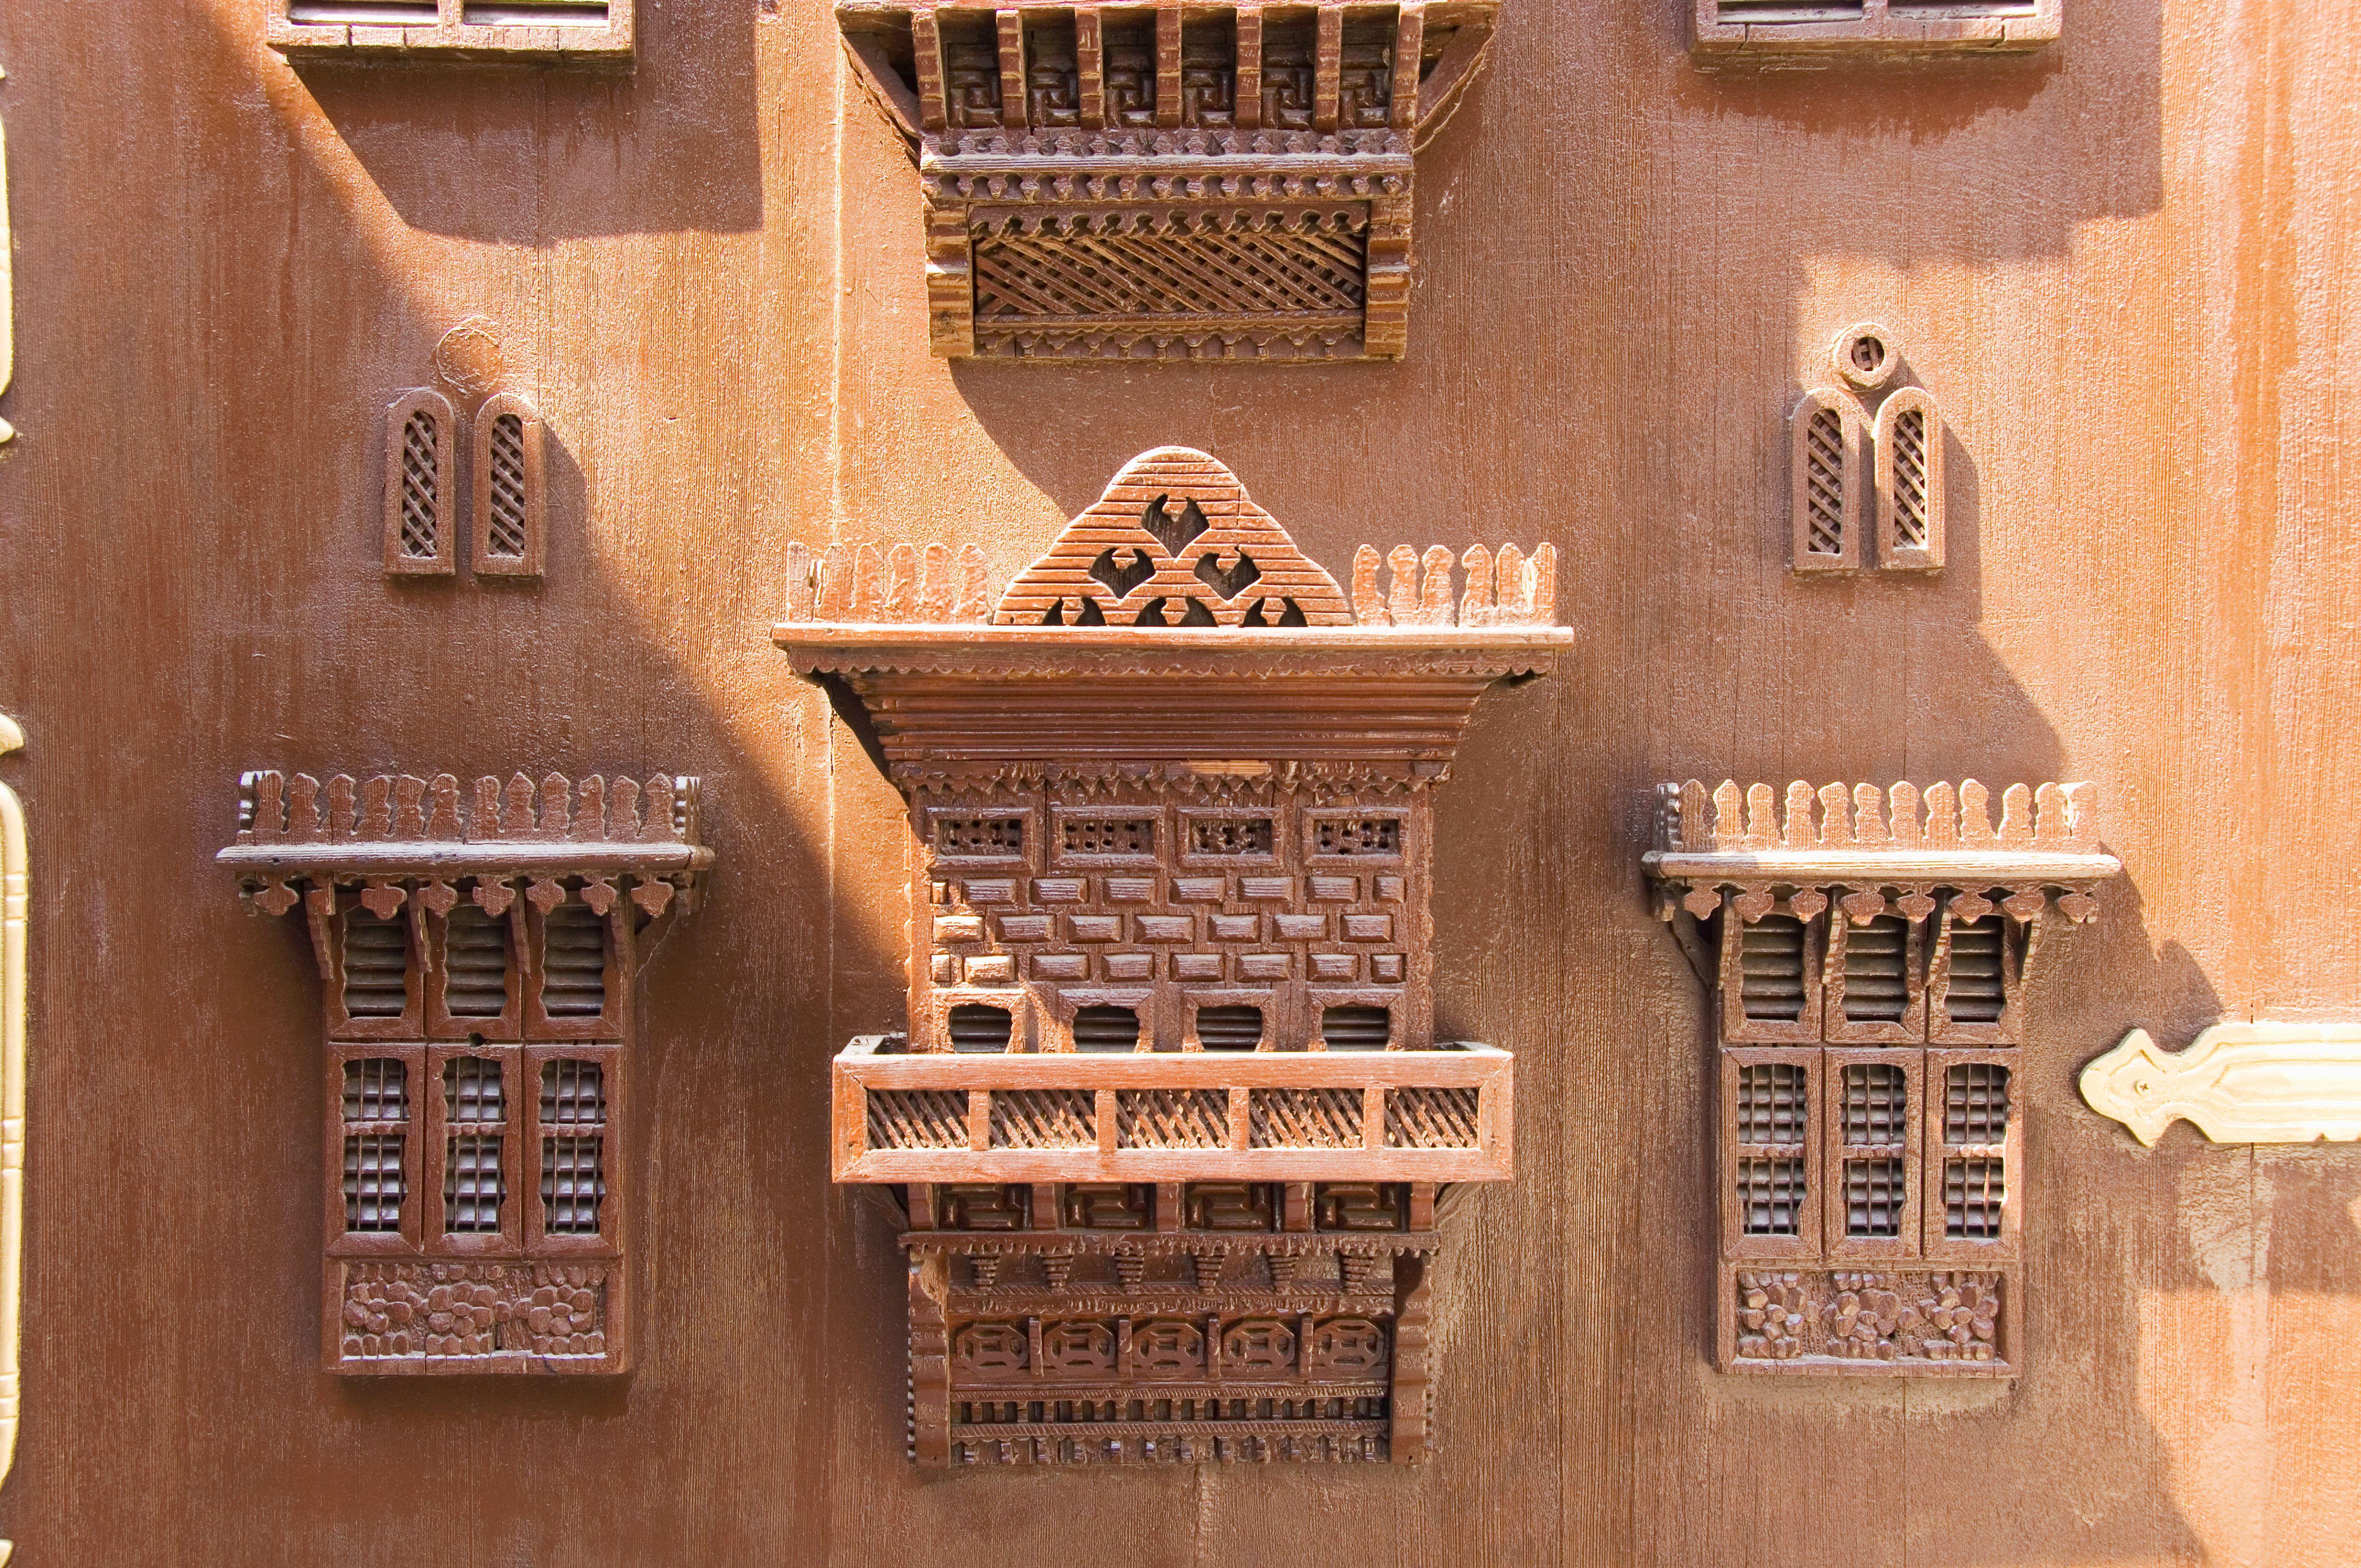 Abdul Raouf Hasan Khalil museum in Makkah Province